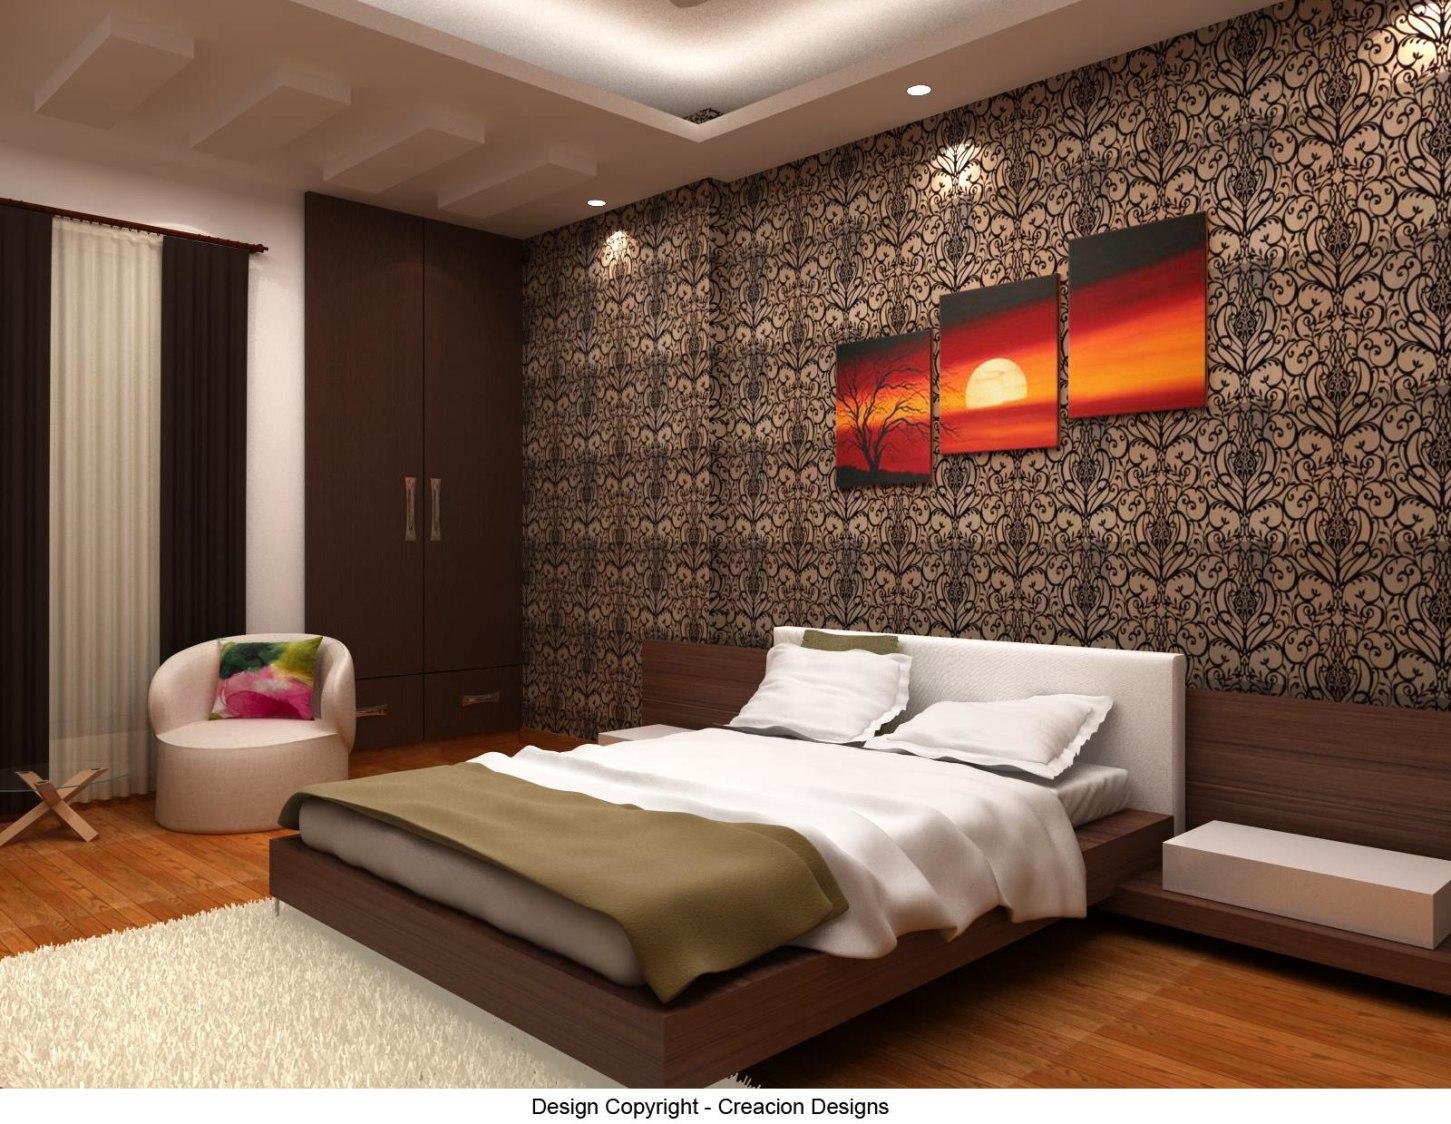 Bedroom With Classic Contemporary Decor by Deepanshu Prasad Bedroom Contemporary   Interior Design Photos & Ideas